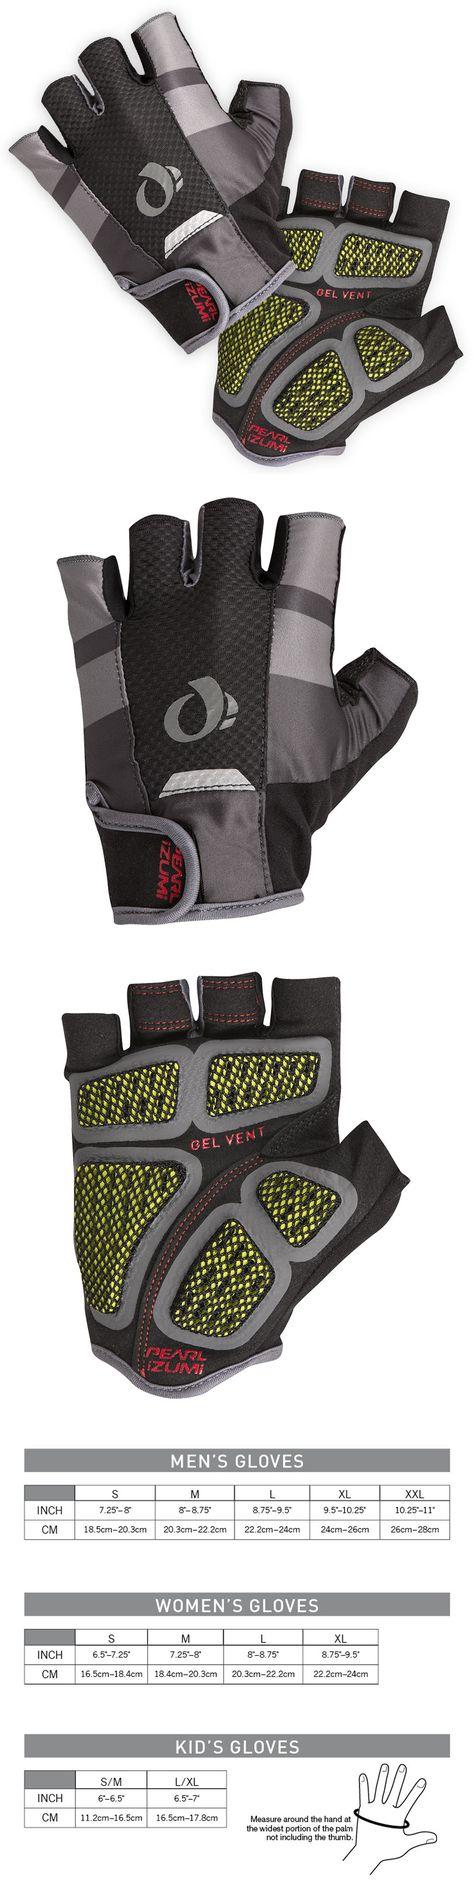 Gloves gill long finger pro gloves large black buy it now